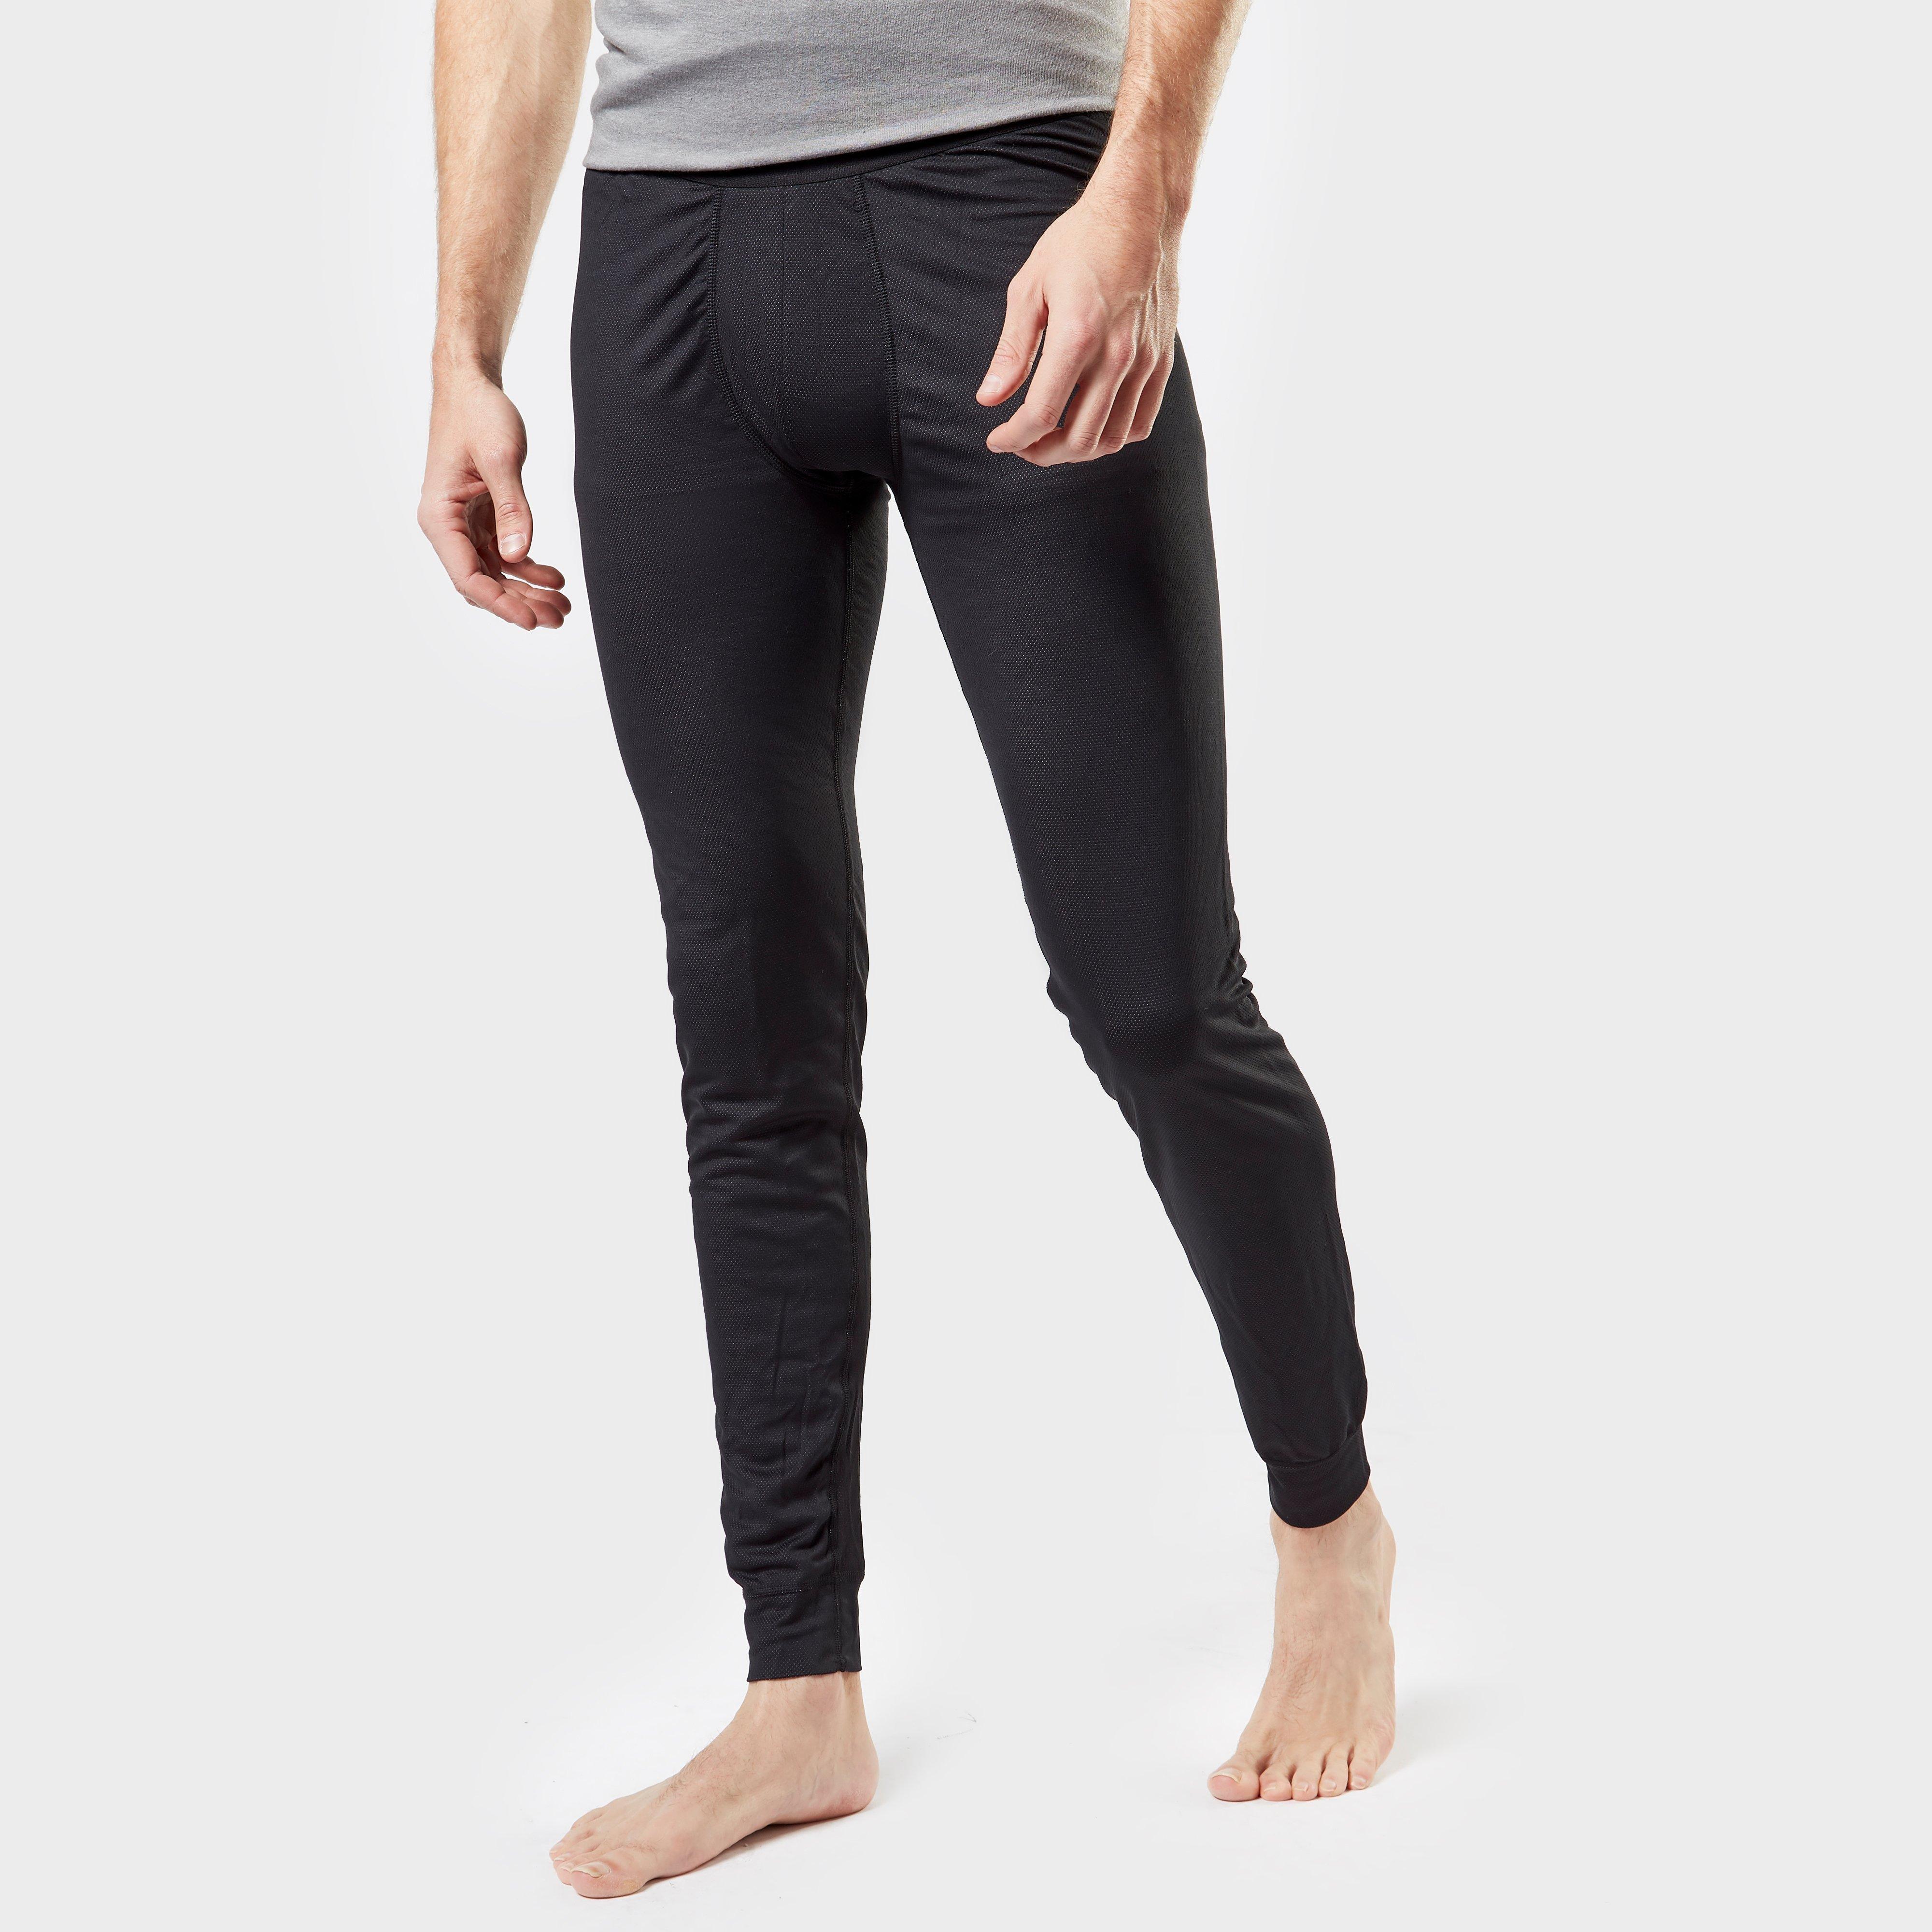 Odlo Odlo Mens Active F-Dry Light Base Layer Pants - Black, Black